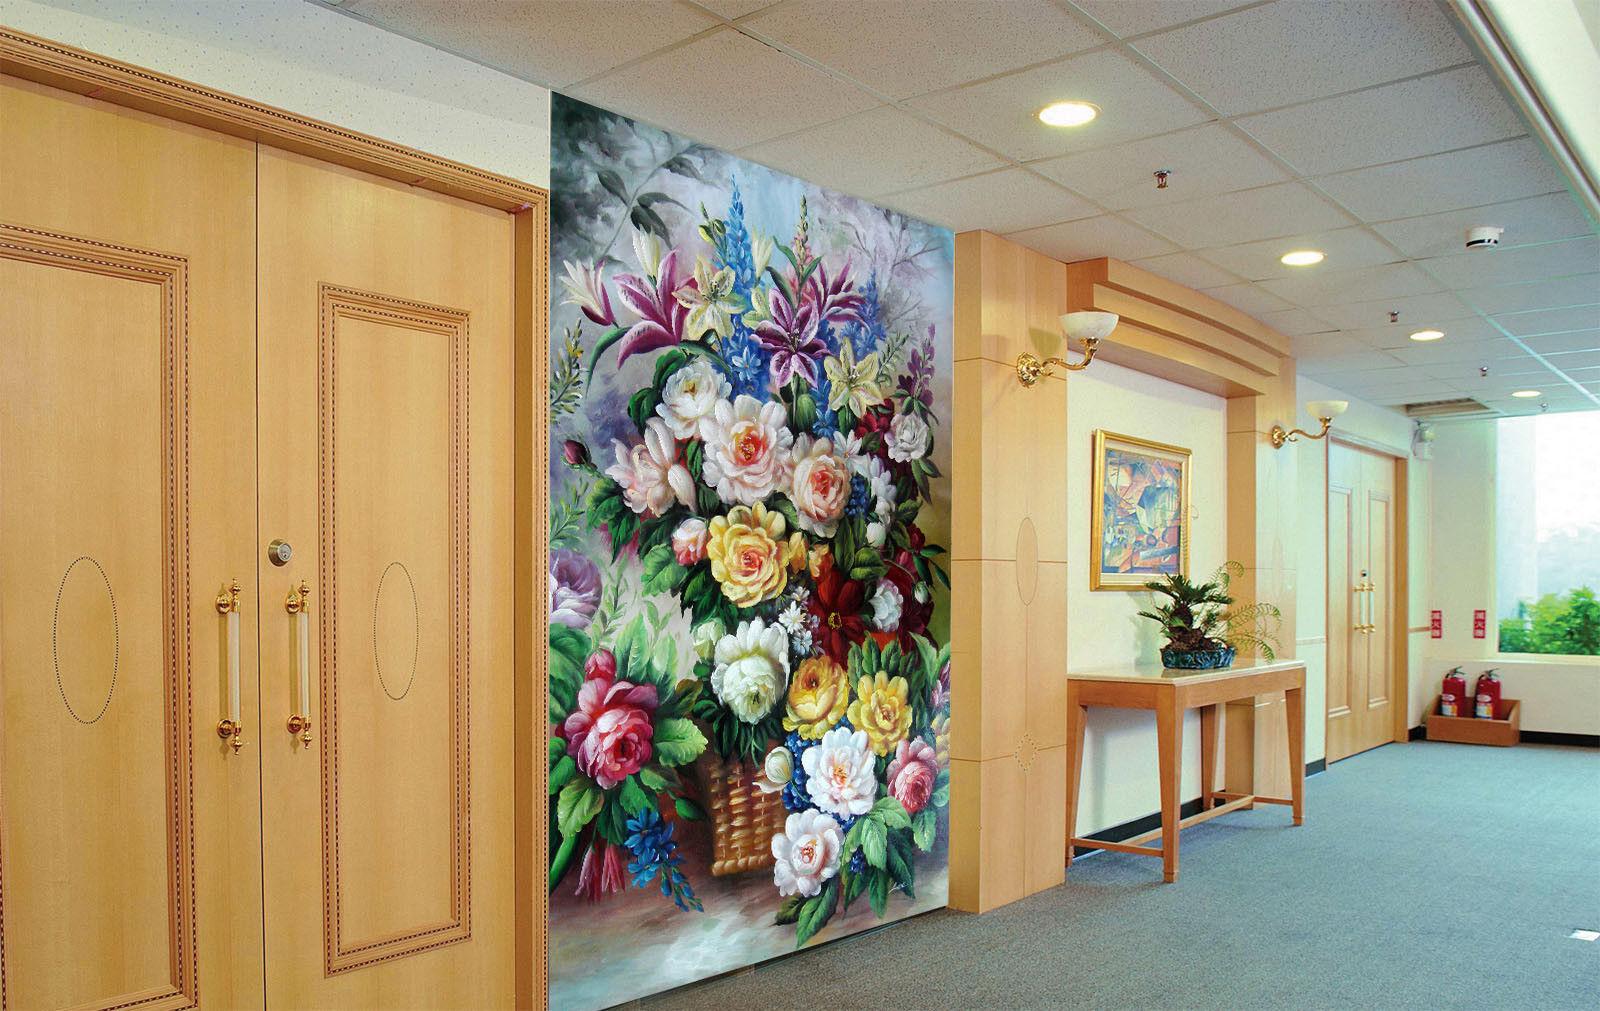 Papel Pintado Mural De Vellón Algunas Flores Hermosas 2 Paisaje Fondo Pansize